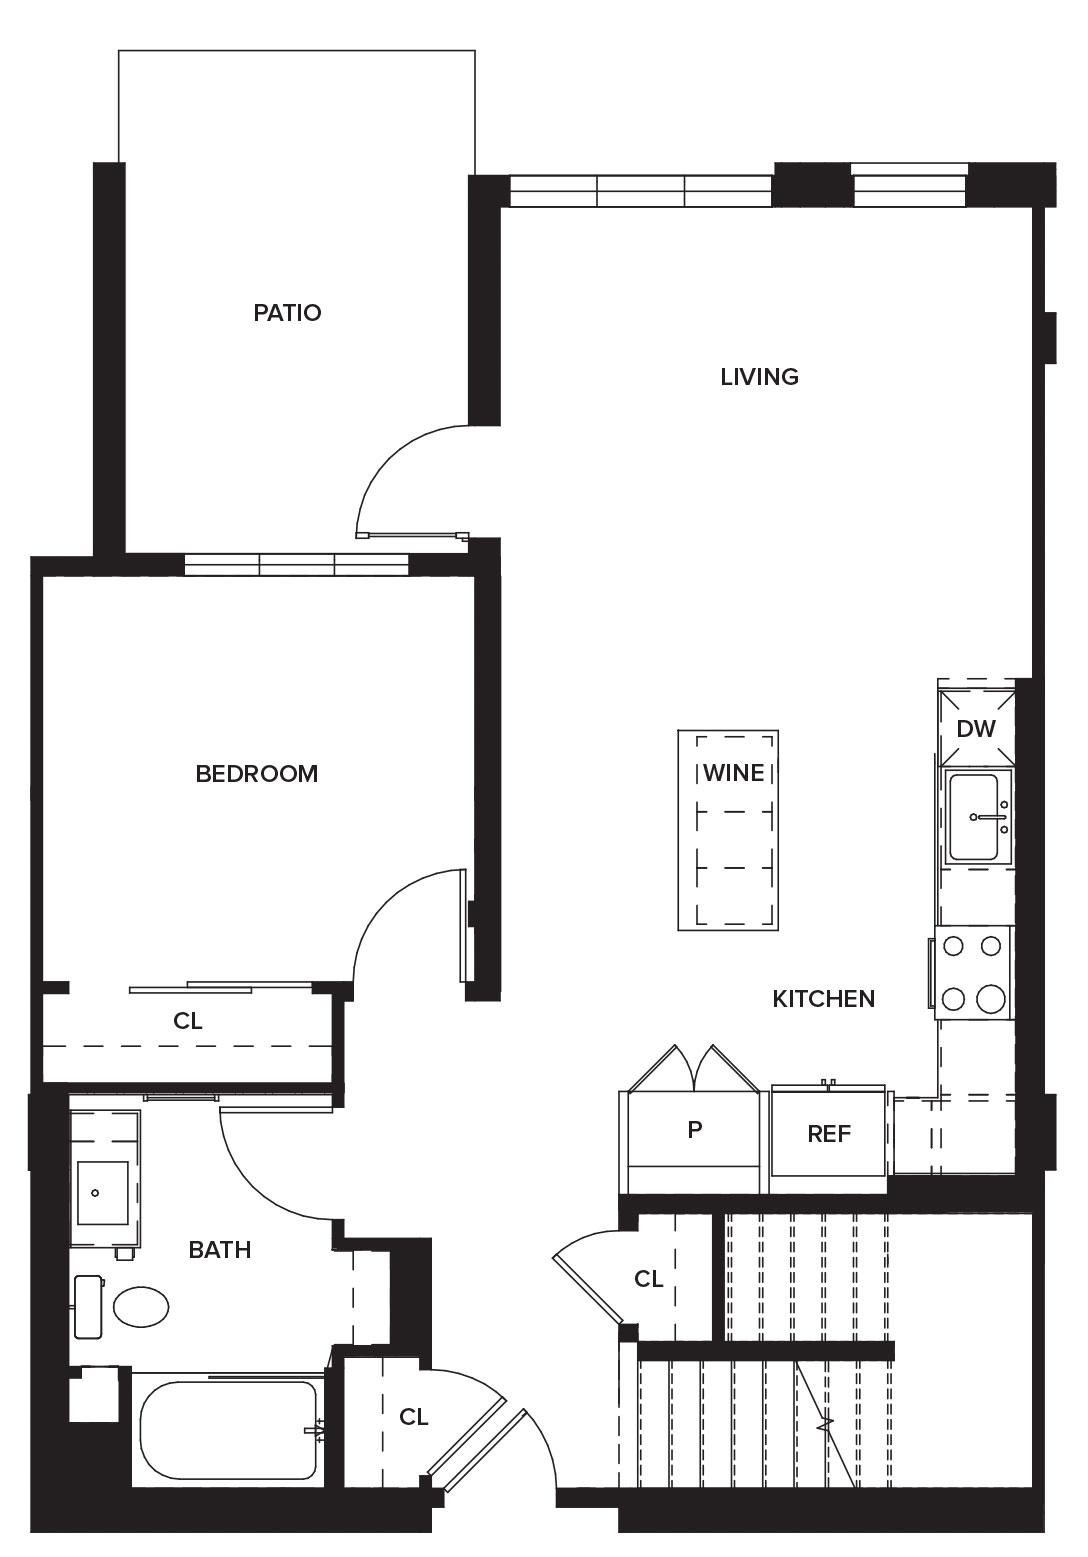 One Paseo Townhome 1 Floorplan